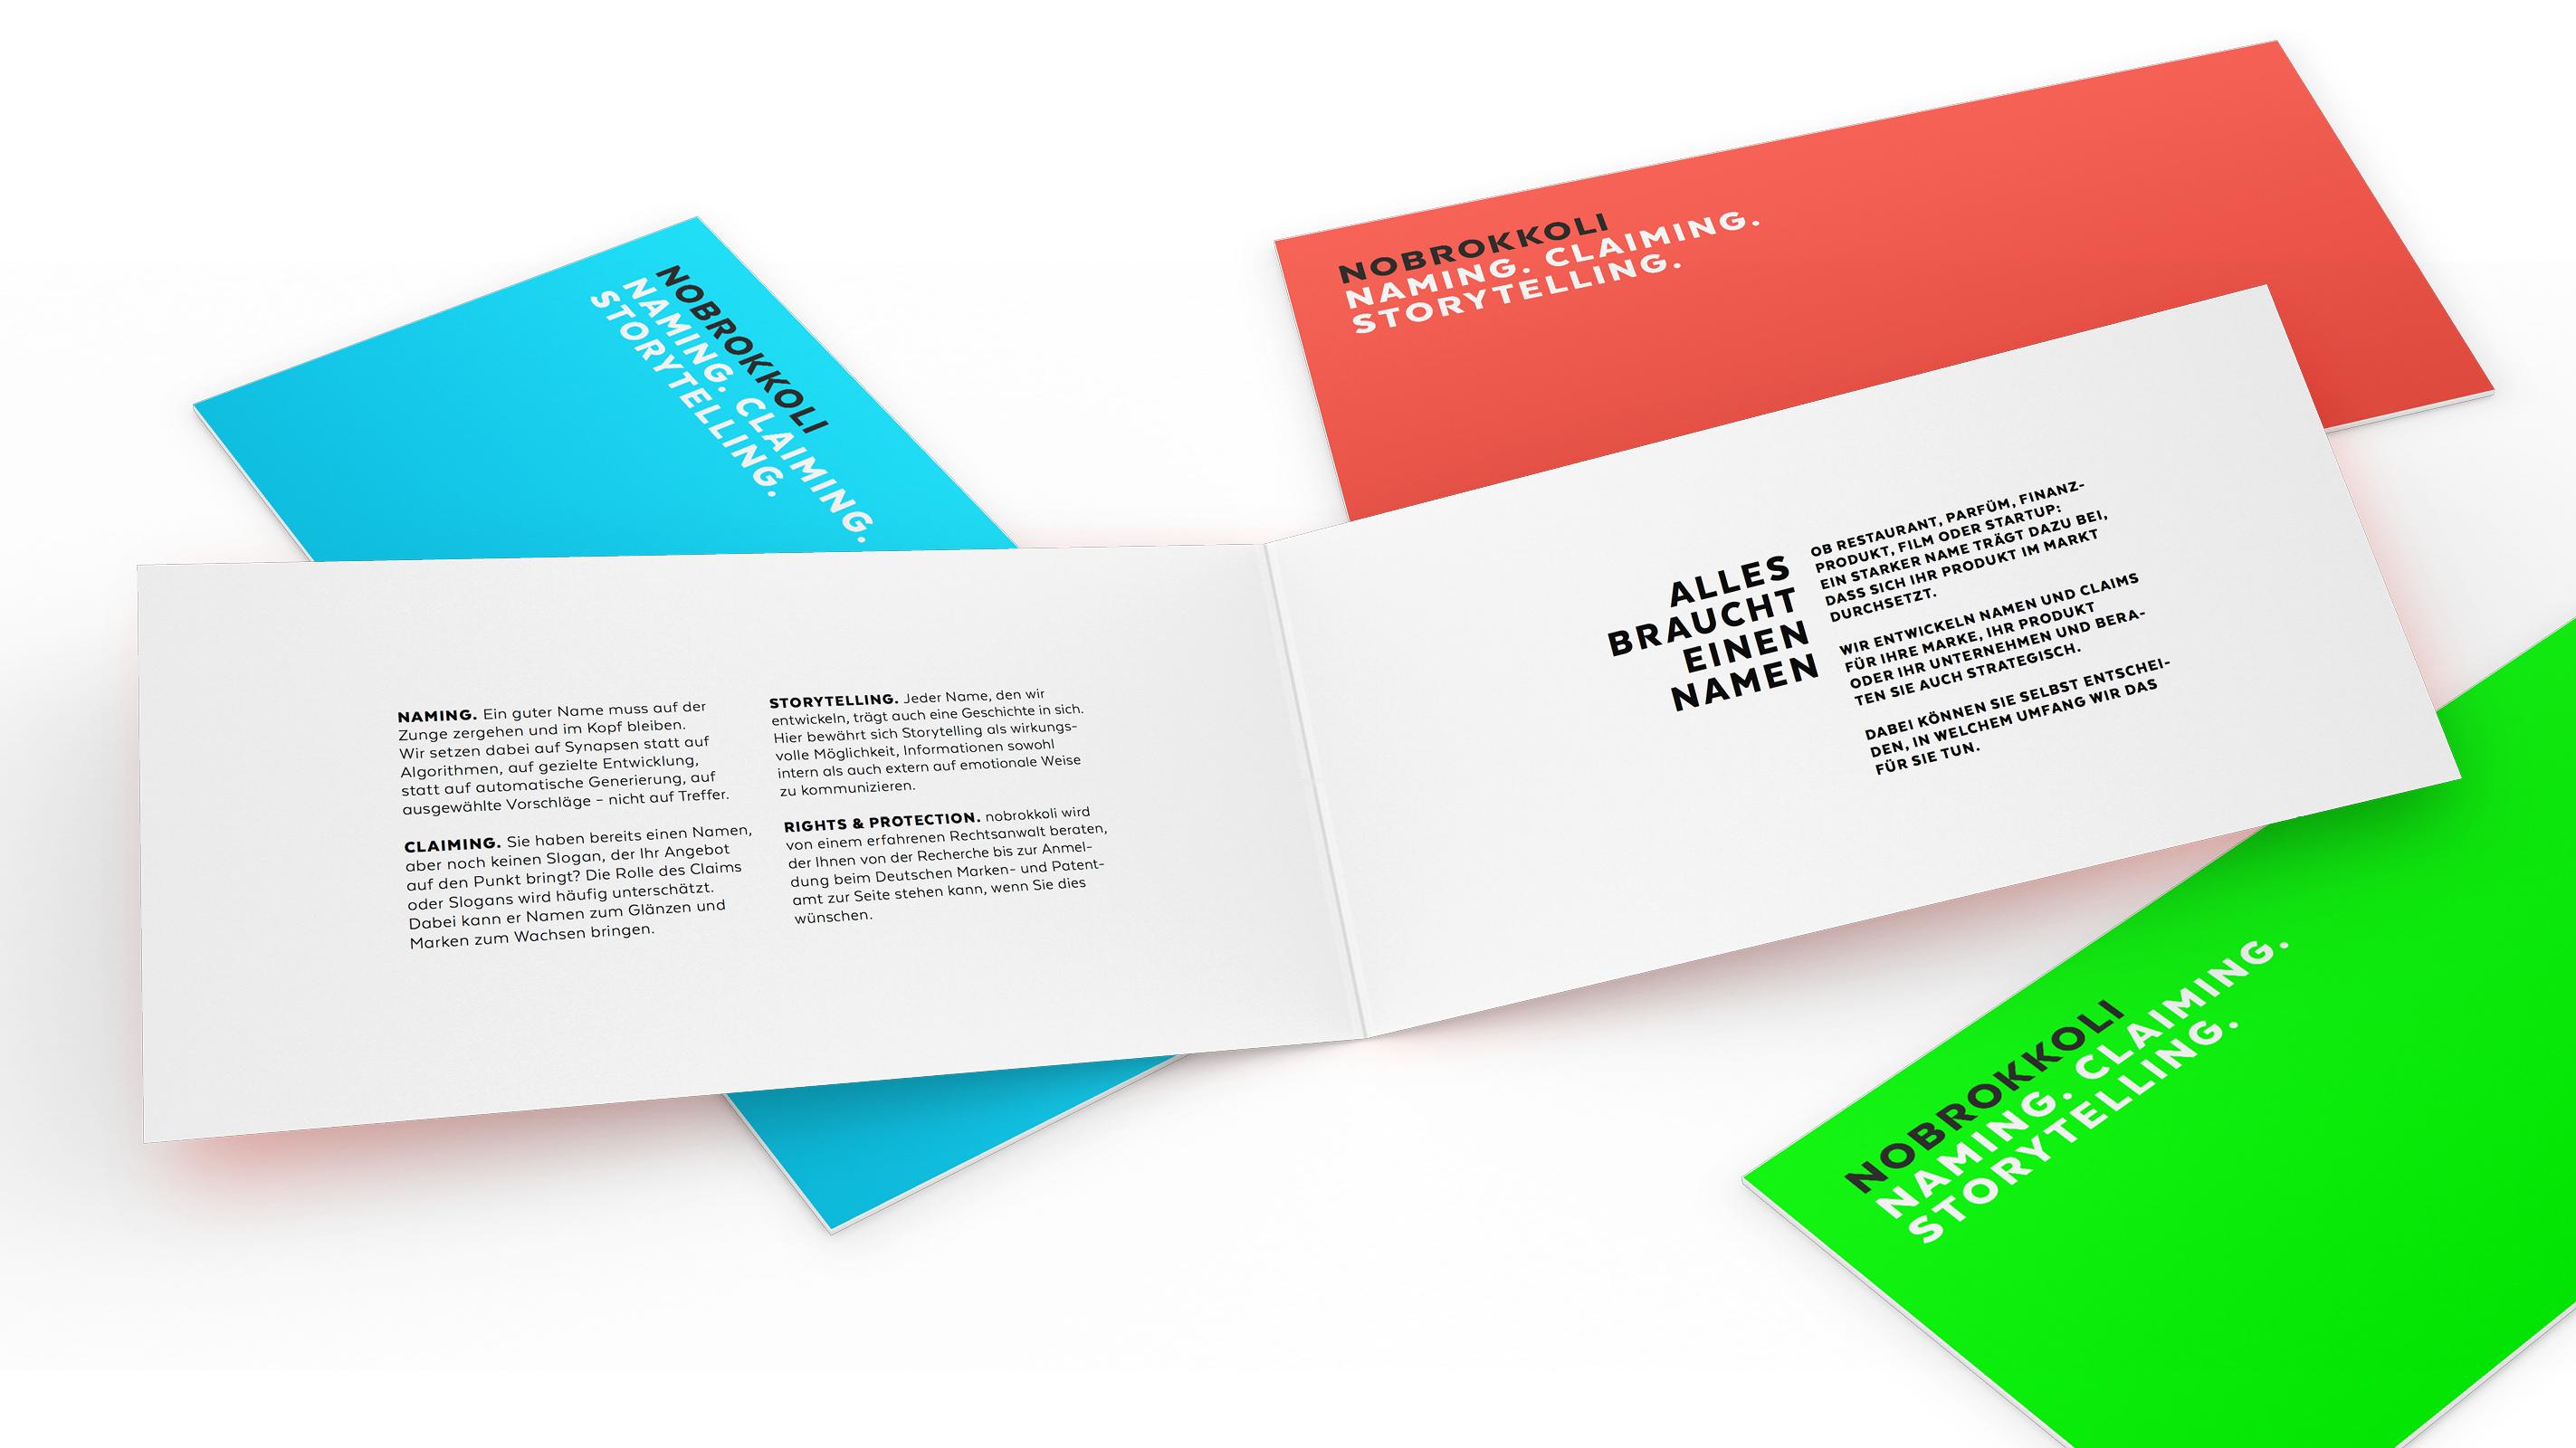 Nobrokkoli – Poarangan Brand Design5